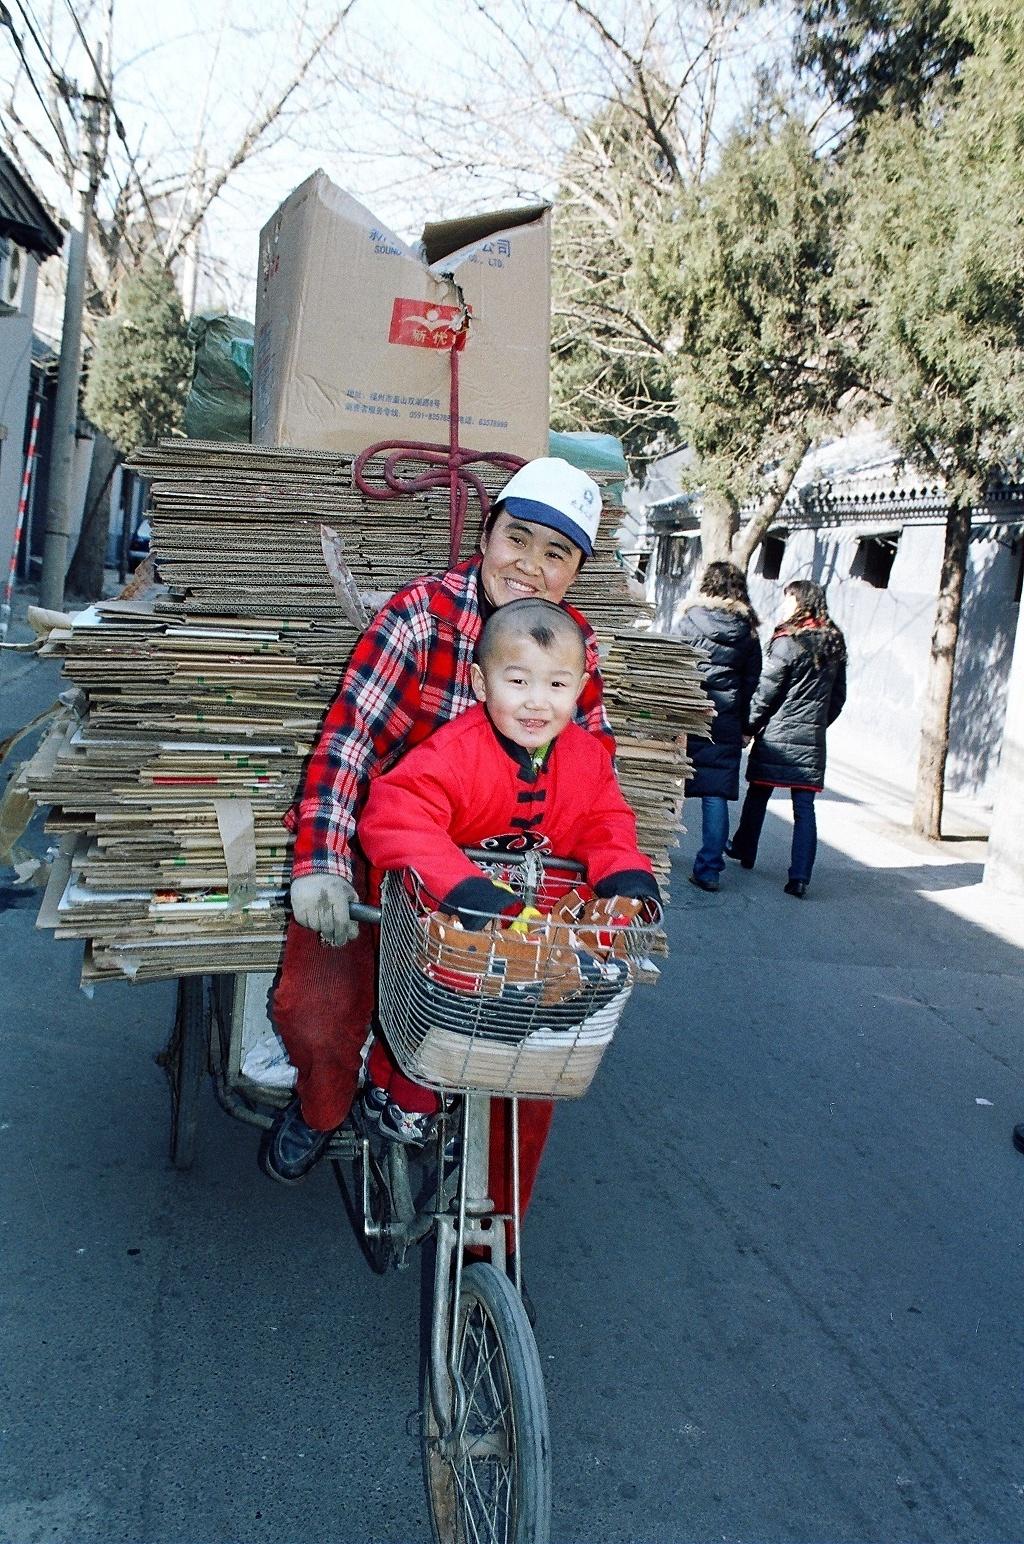 Mom and little boy with cardboard on bike.JPG